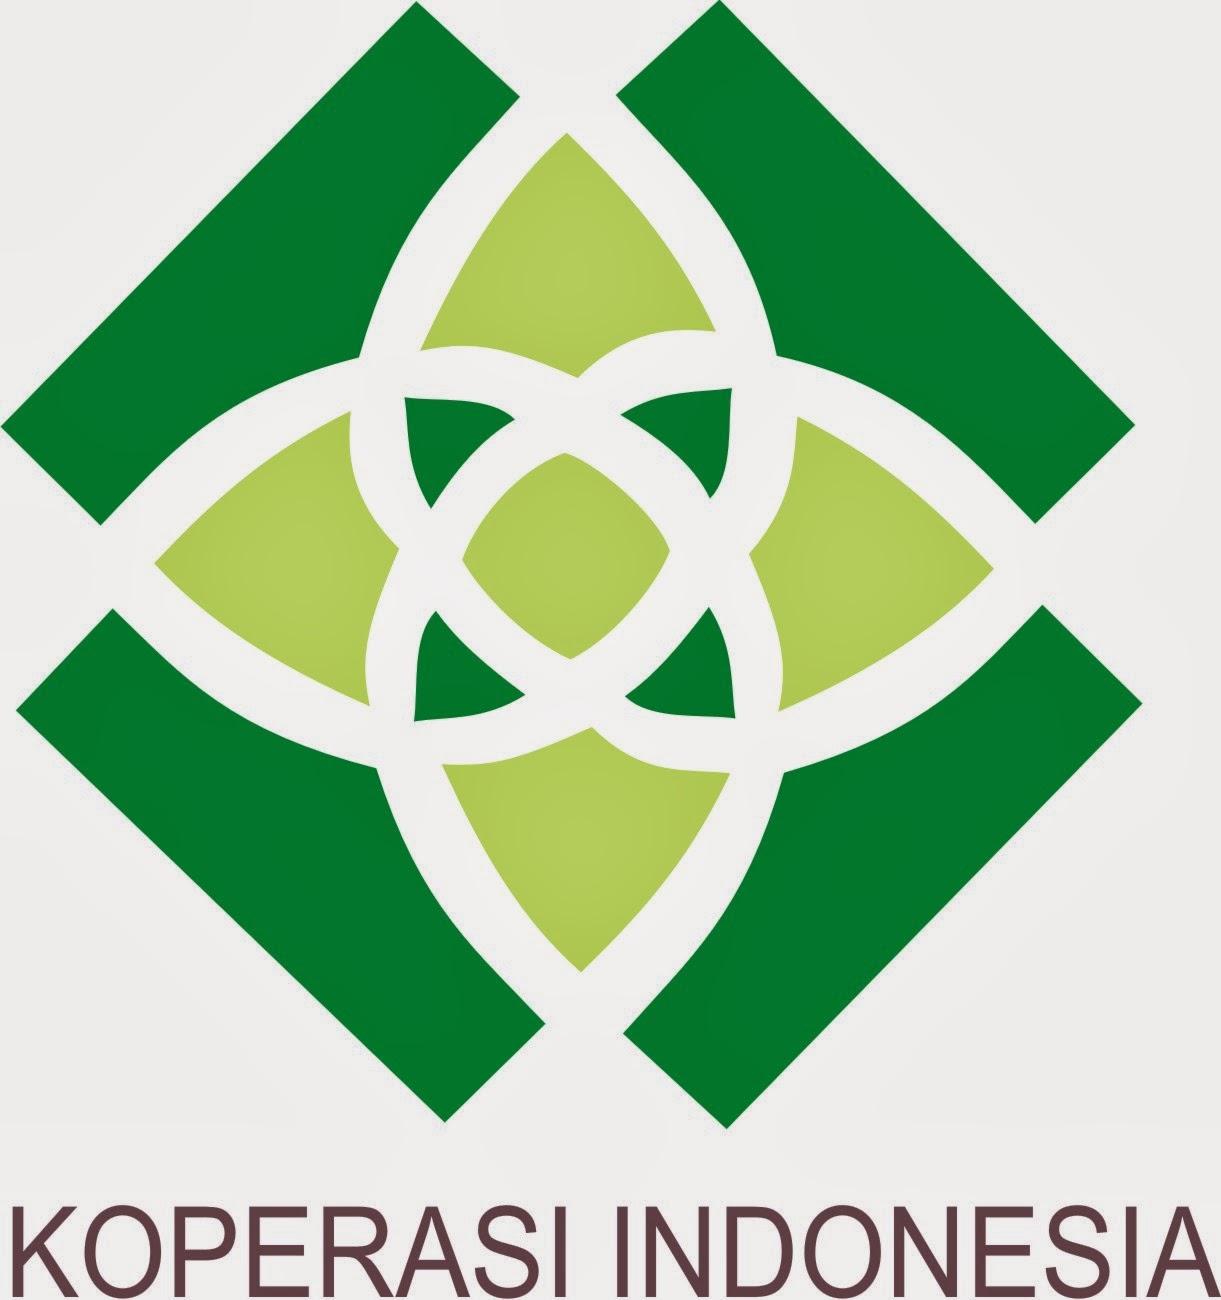 LOGO TERBARU  Gambar Logo